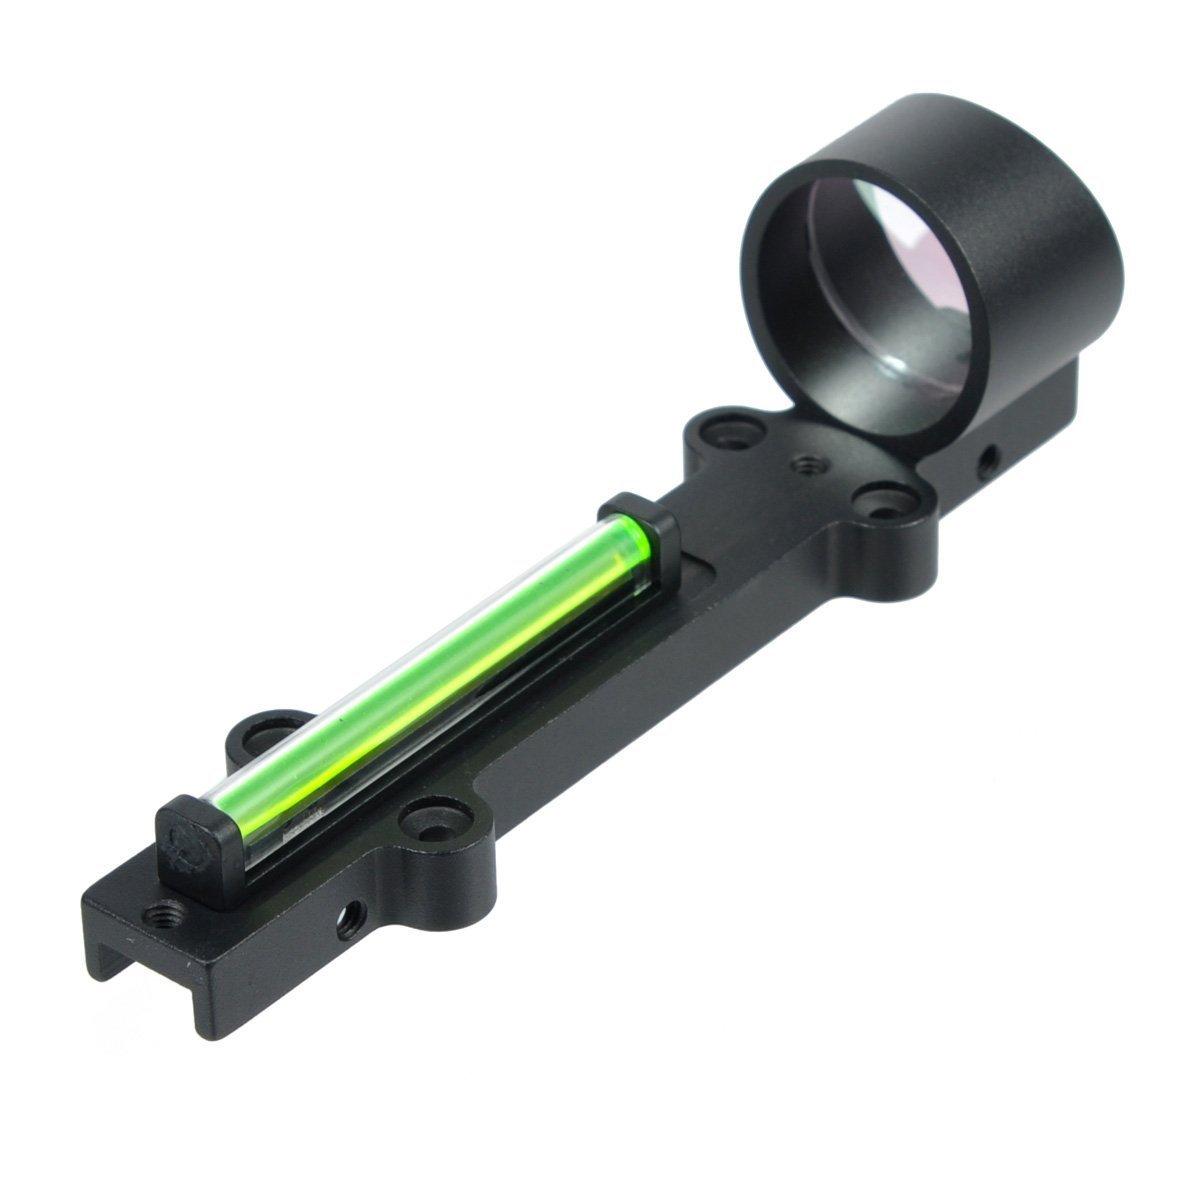 Gazelle Trading Fiber Optic Sight Pilad PF01x28. Reflx Sight with Light Red Dot. Works. 3 MOA. Shvabe (Green)